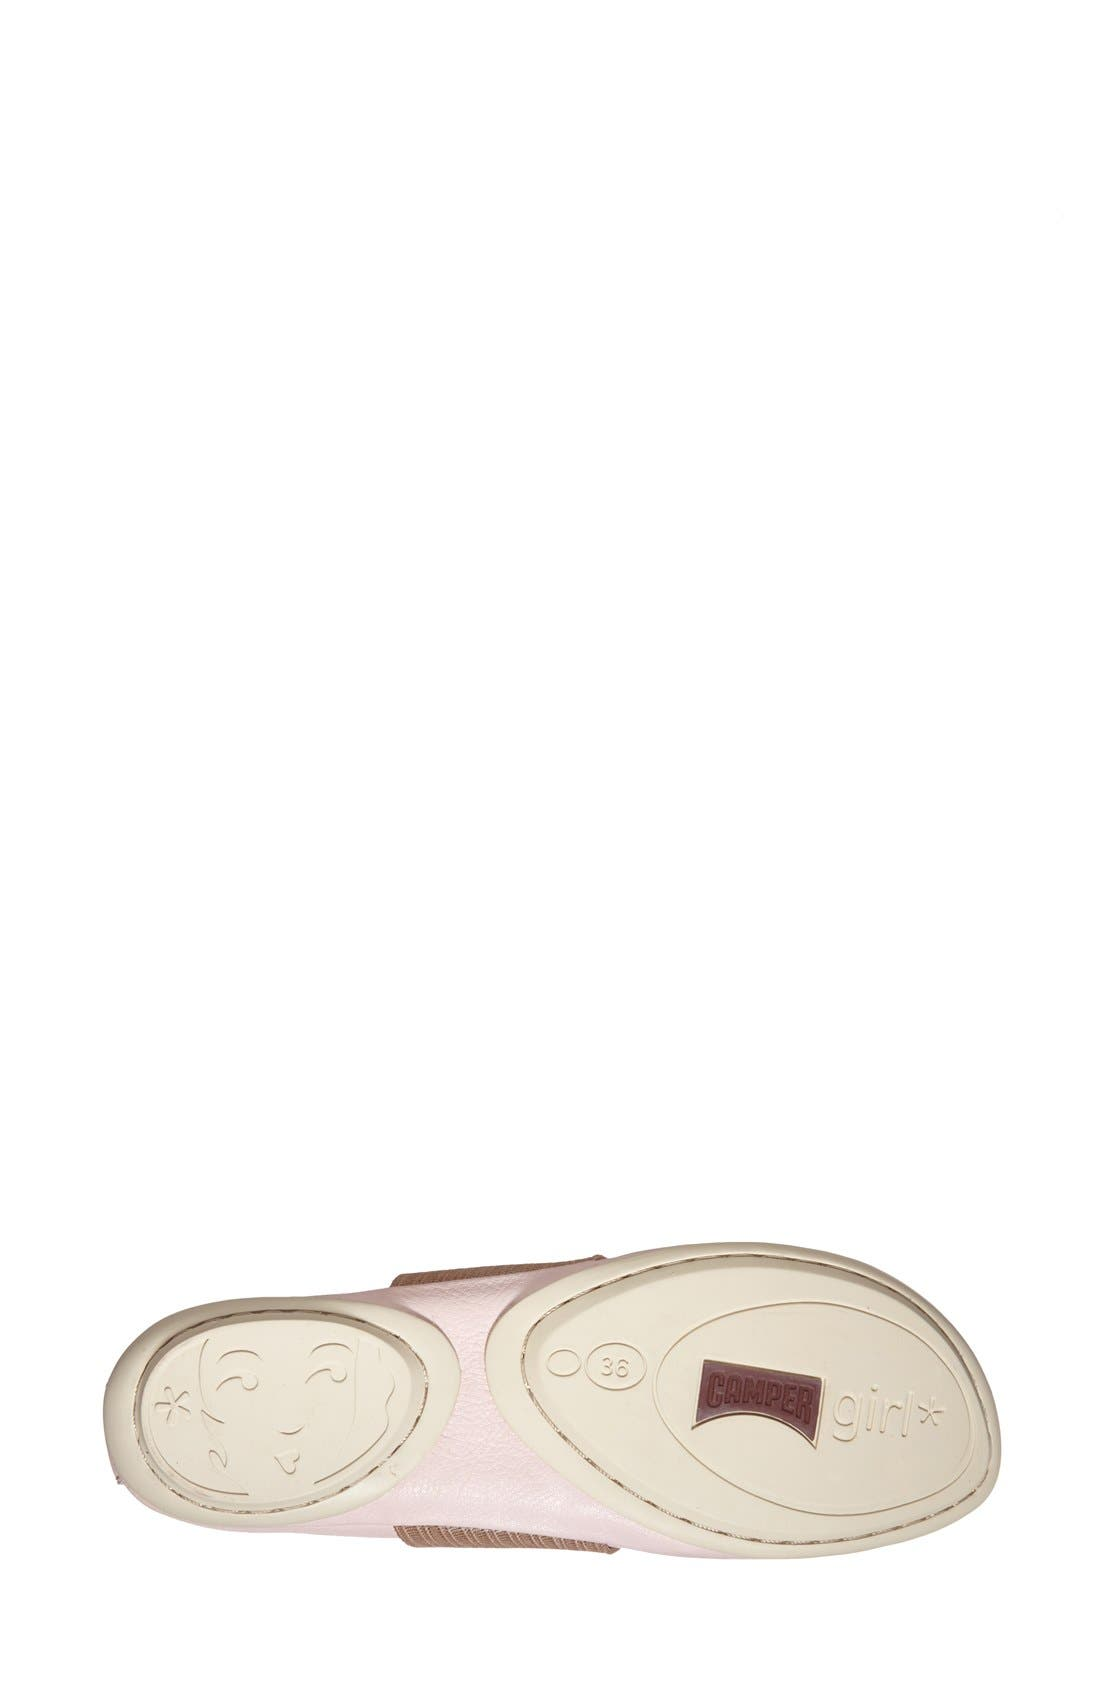 'Right Nina' Leather Ballerina Flat,                             Alternate thumbnail 135, color,